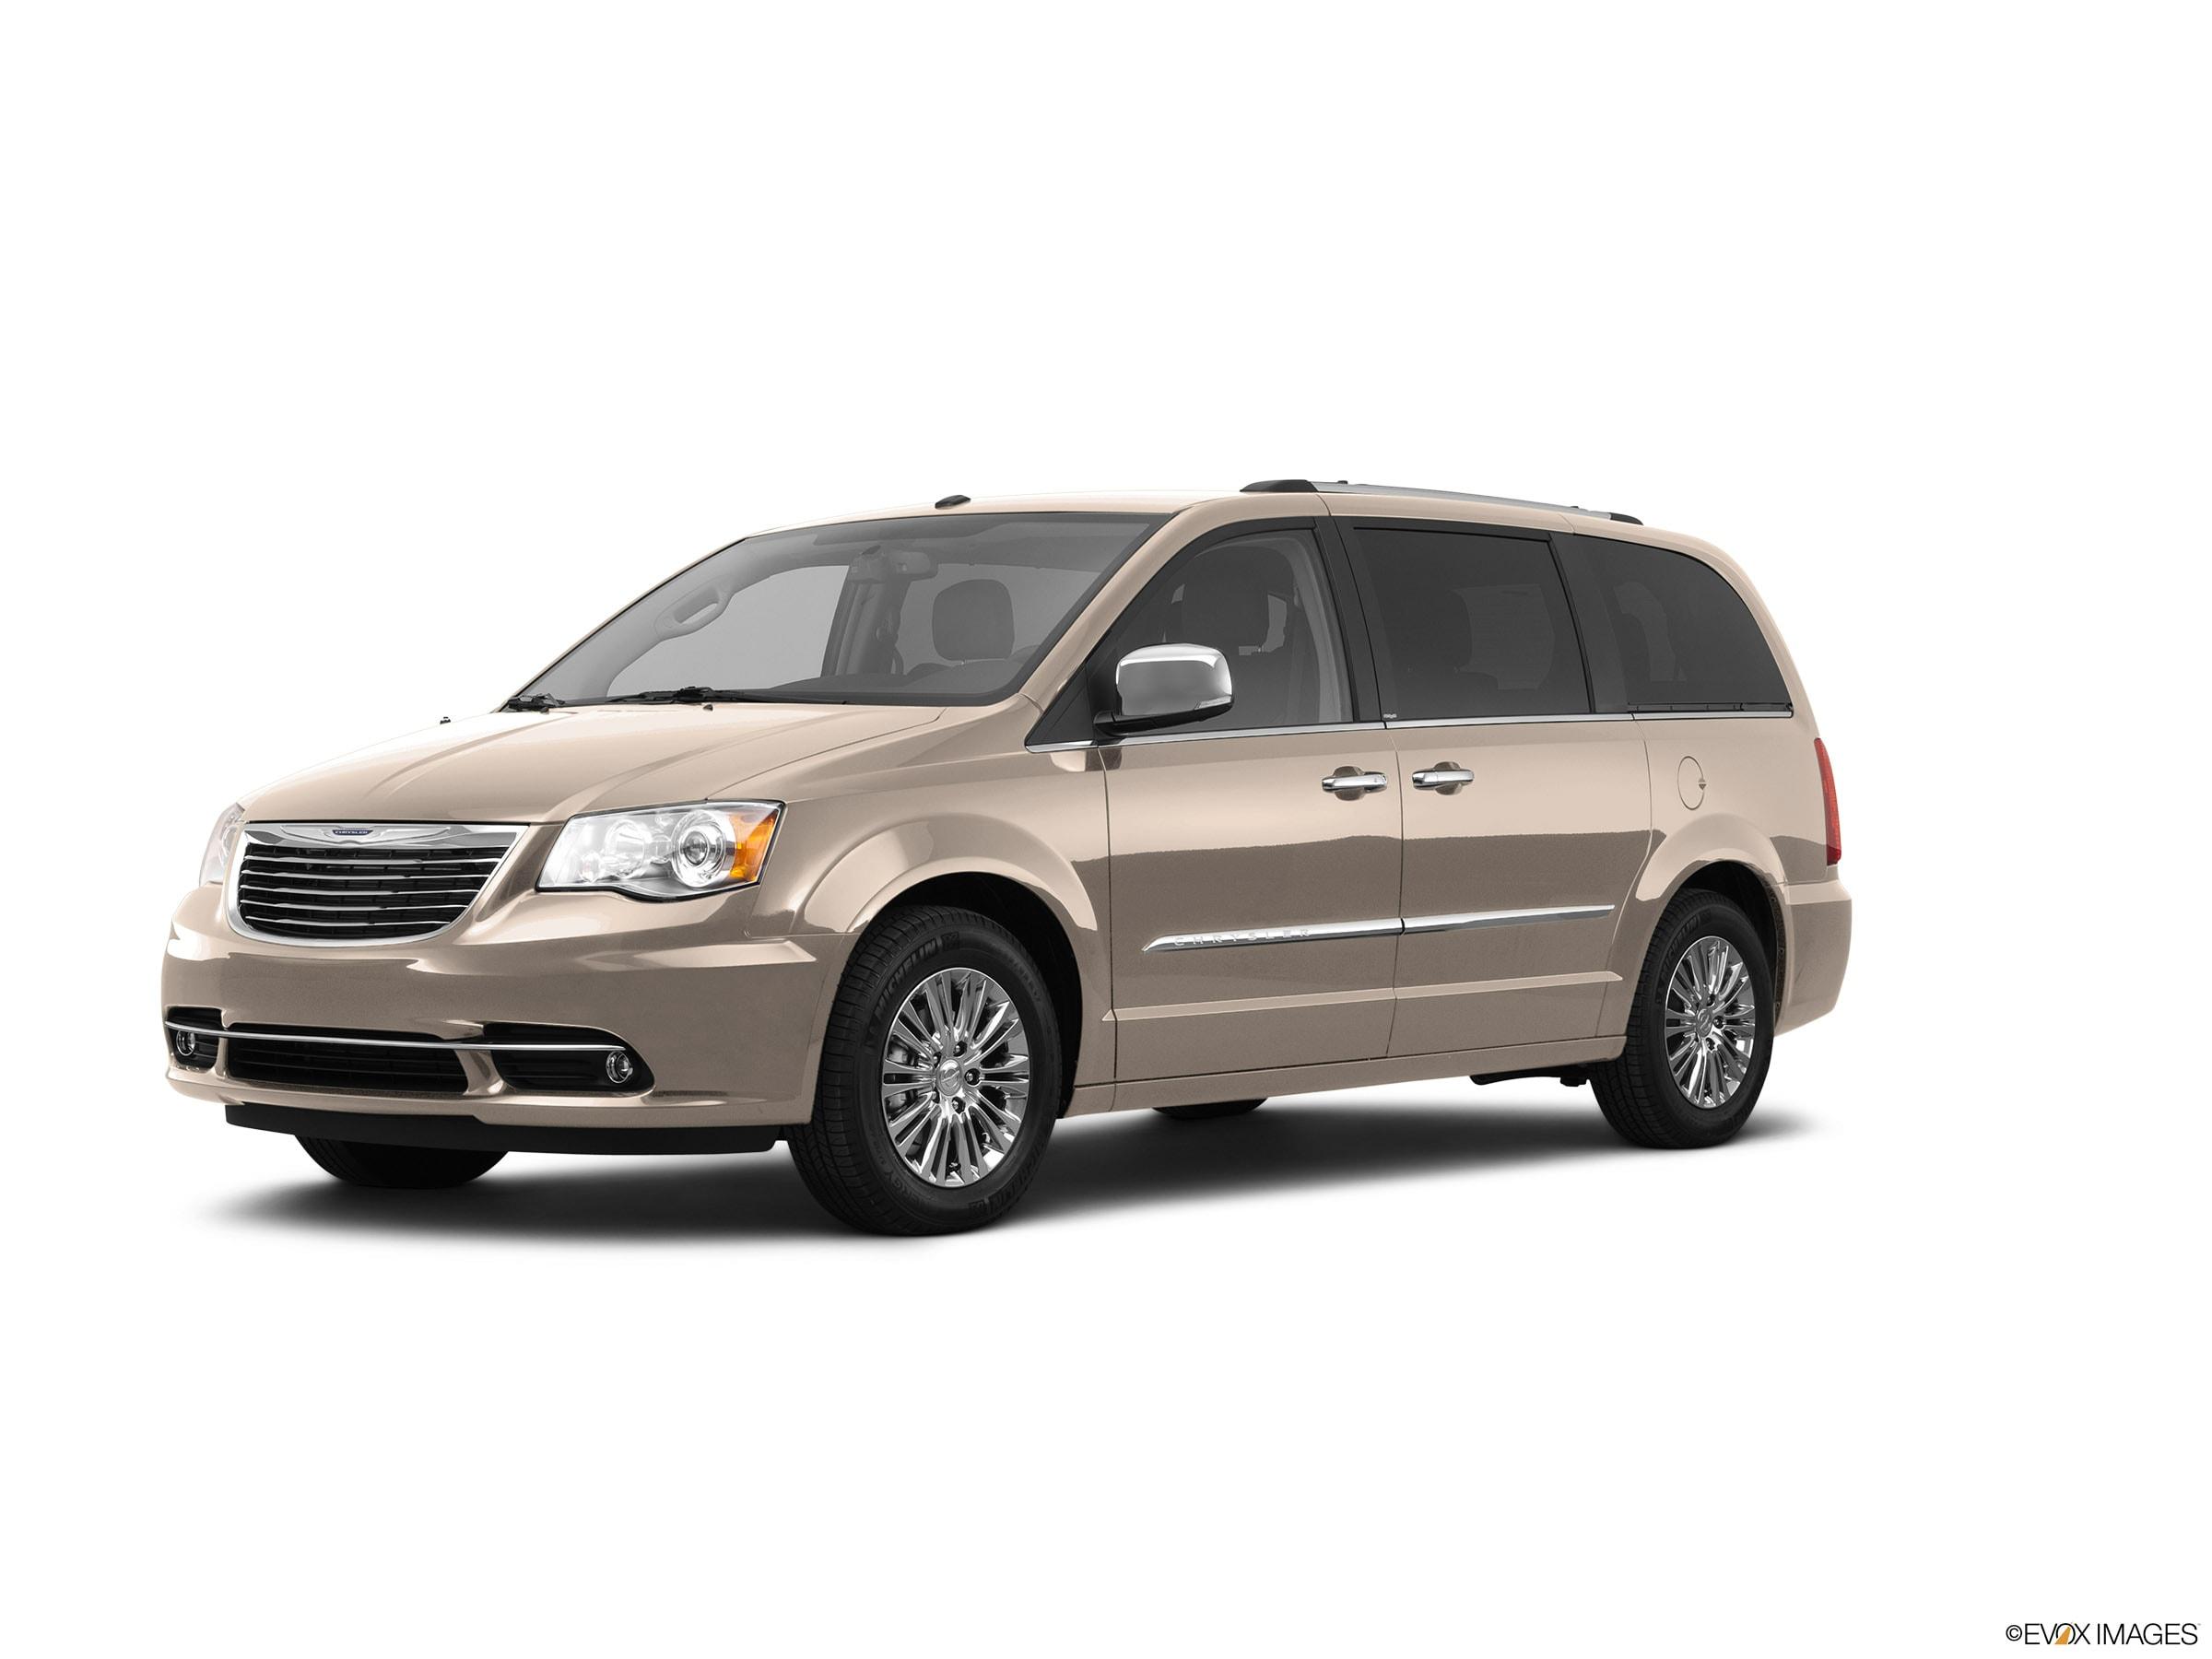 2011 Chrysler Town & Country Minivan/Van